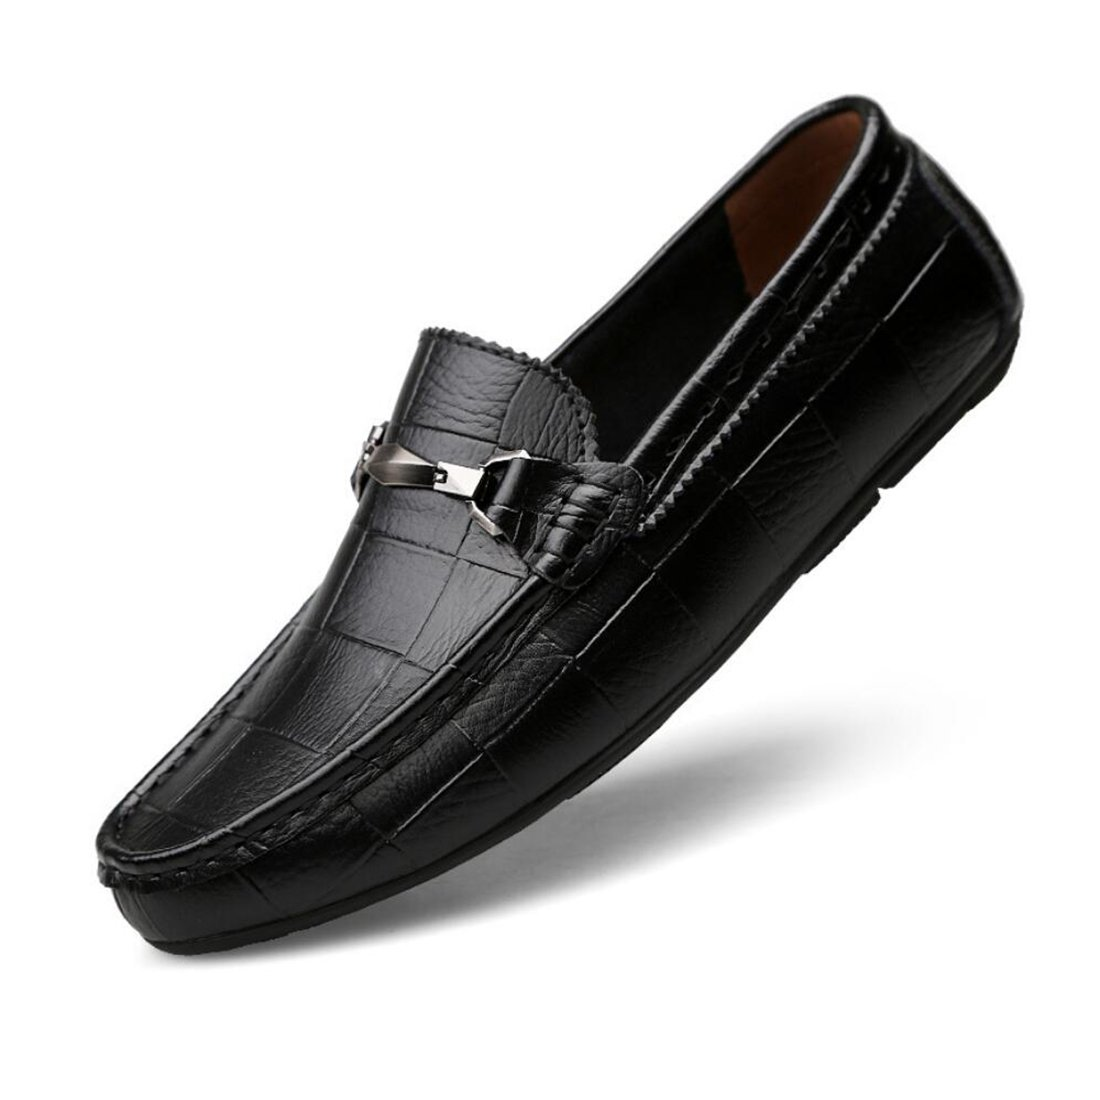 CAI Herrenschuhe PU Frühling/Sommer / Herbst Herren Faul Fahr Schuhe Mode Mode Bean Schuhe Loafers & Slip-Ons Niedrig Top Single Schuhe (Farbe : Schwarz, Größe : 42)